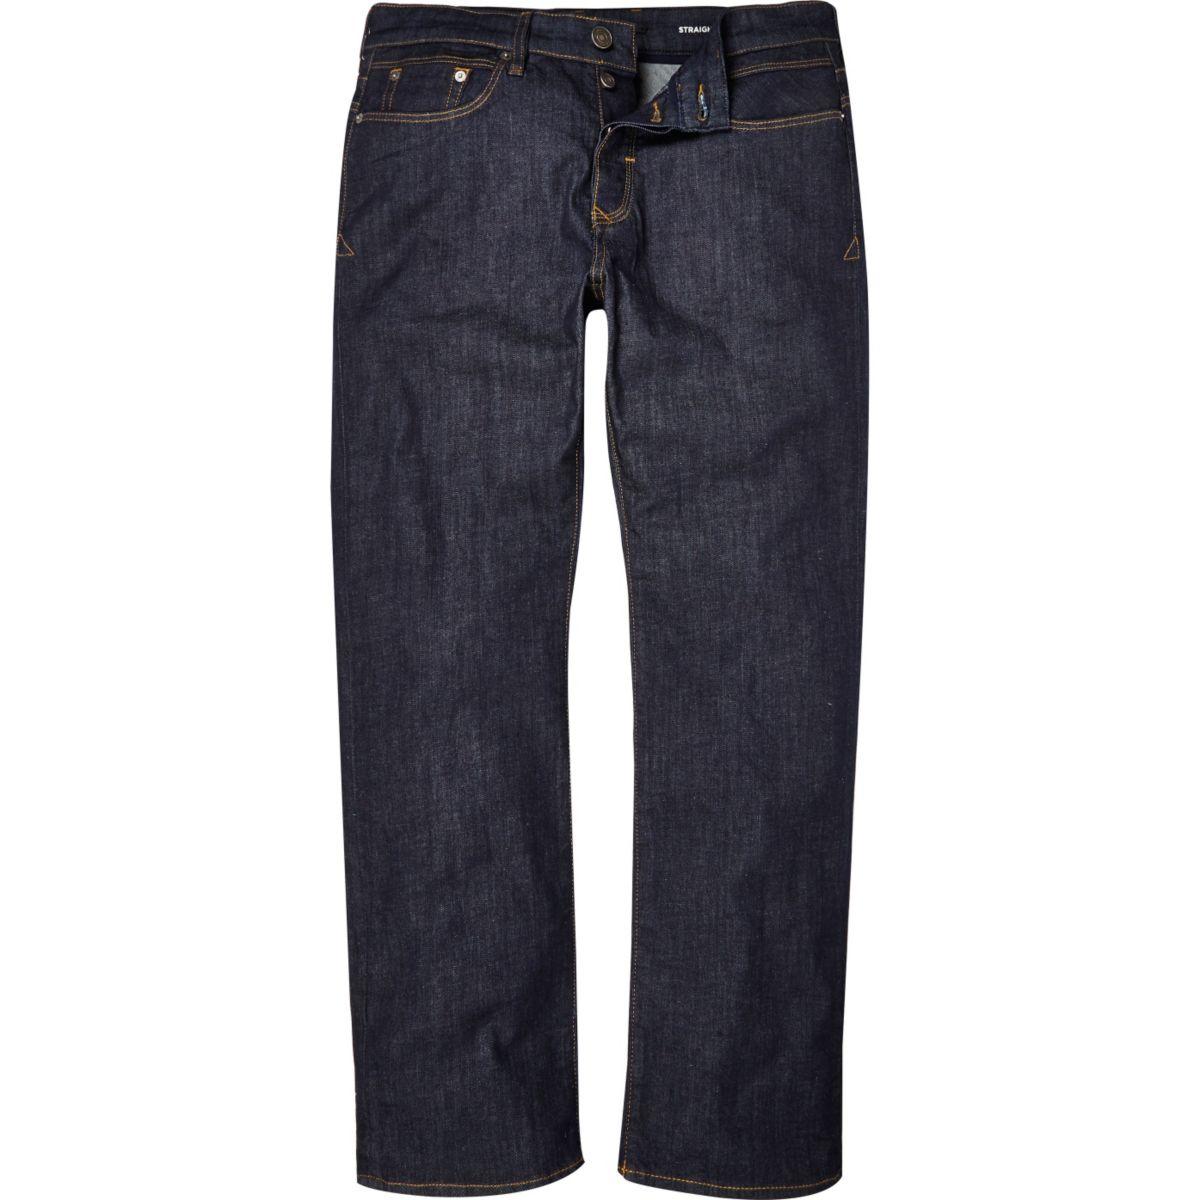 Dark wash Clint bootcut jeans